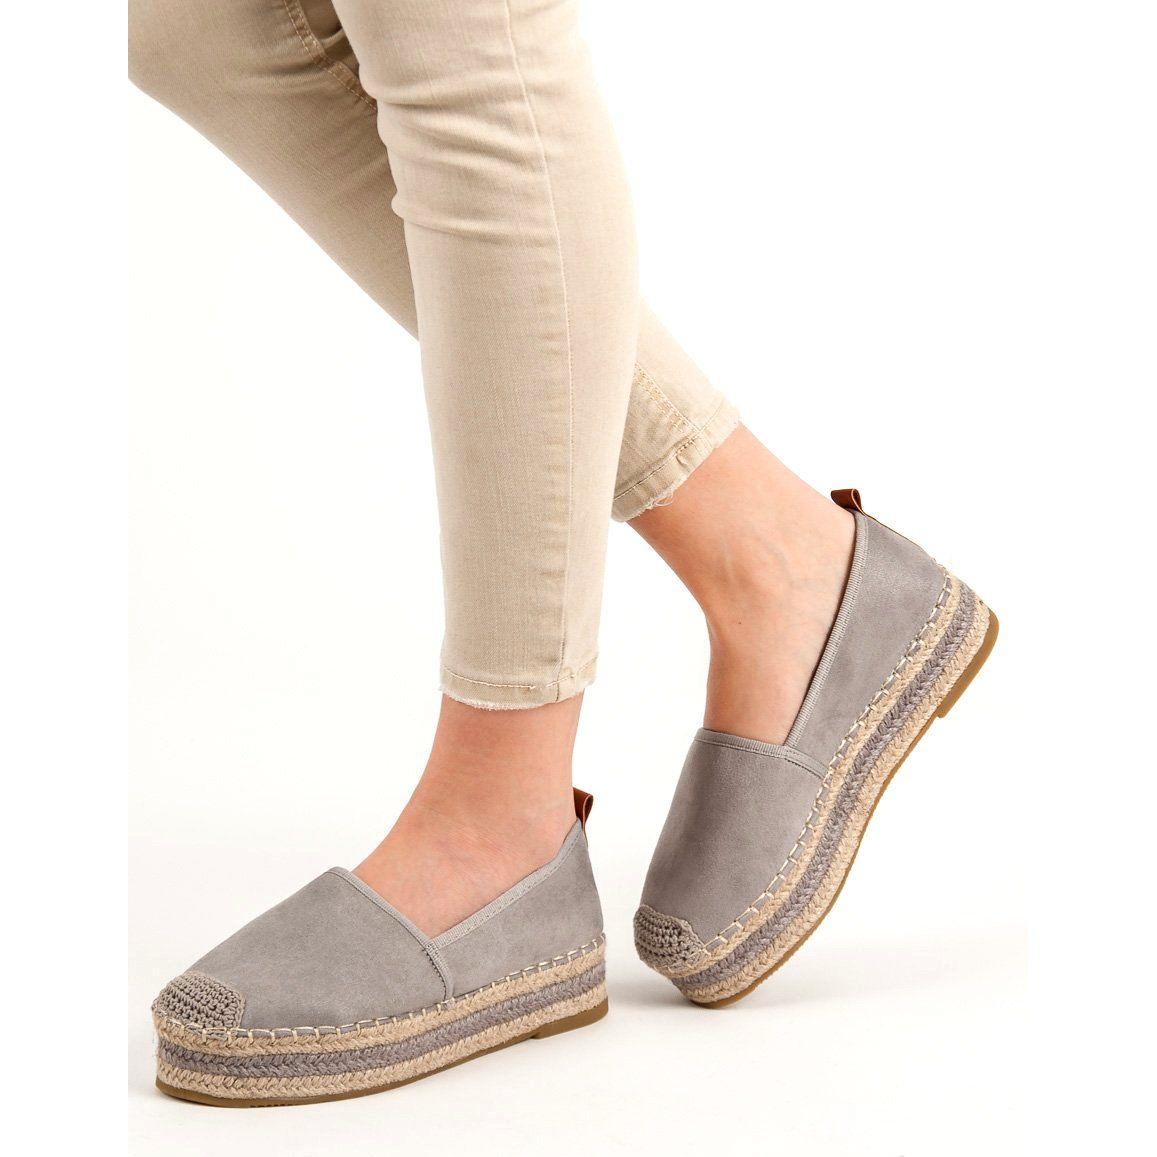 Coura Zamszowe Espadryle Na Platformie Szare Espadrilles Flat Espadrille Shoes